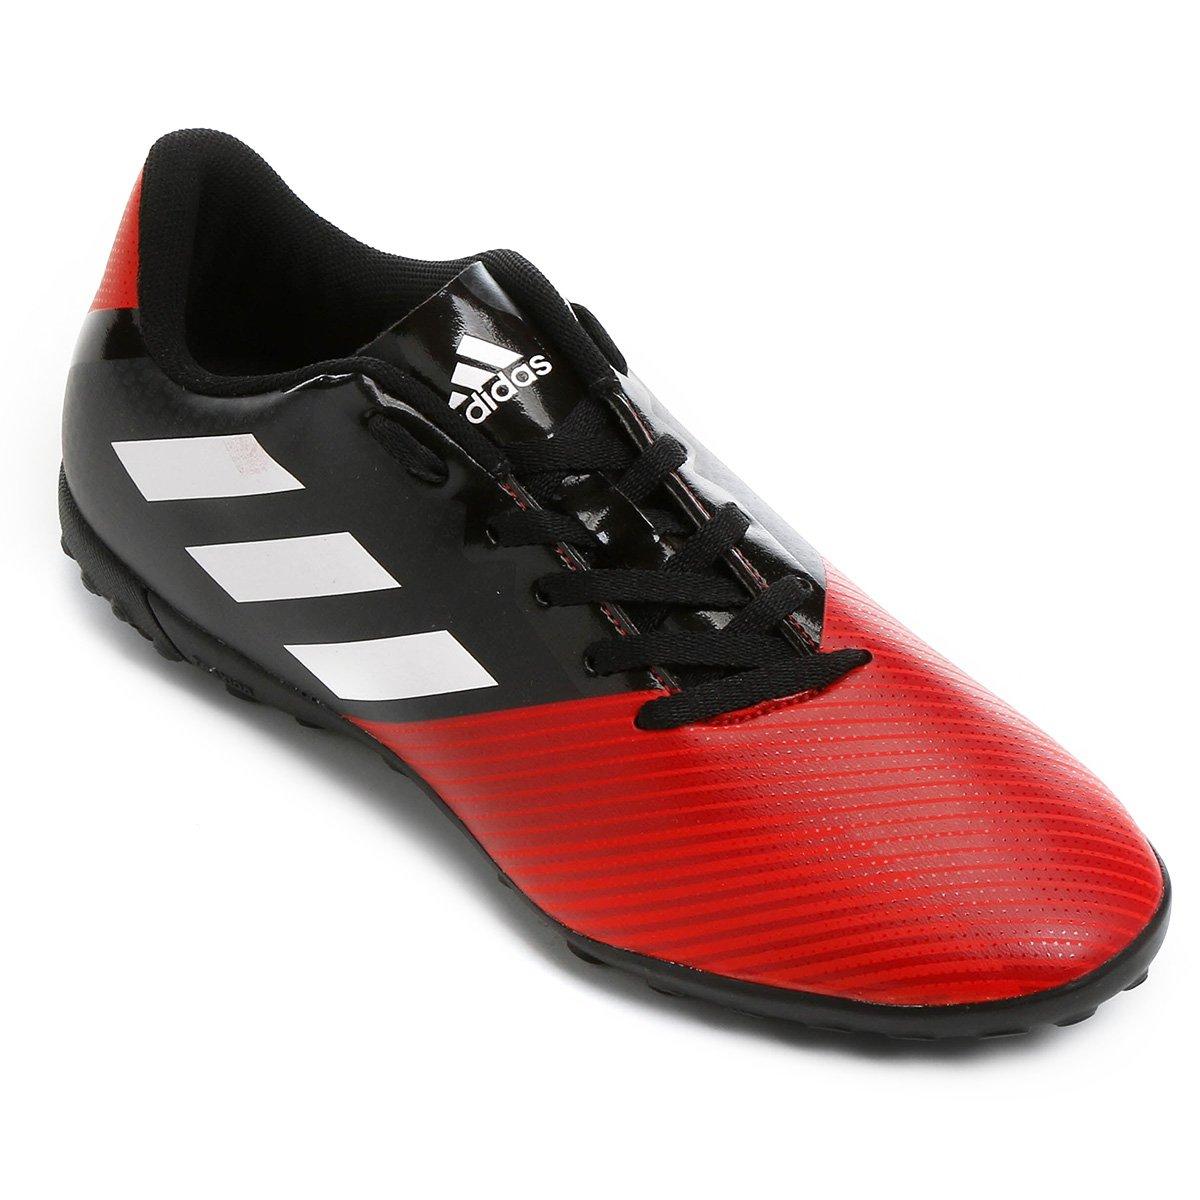 6d2dd405d5 Chuteira Society Adidas Artilheira 17 TF